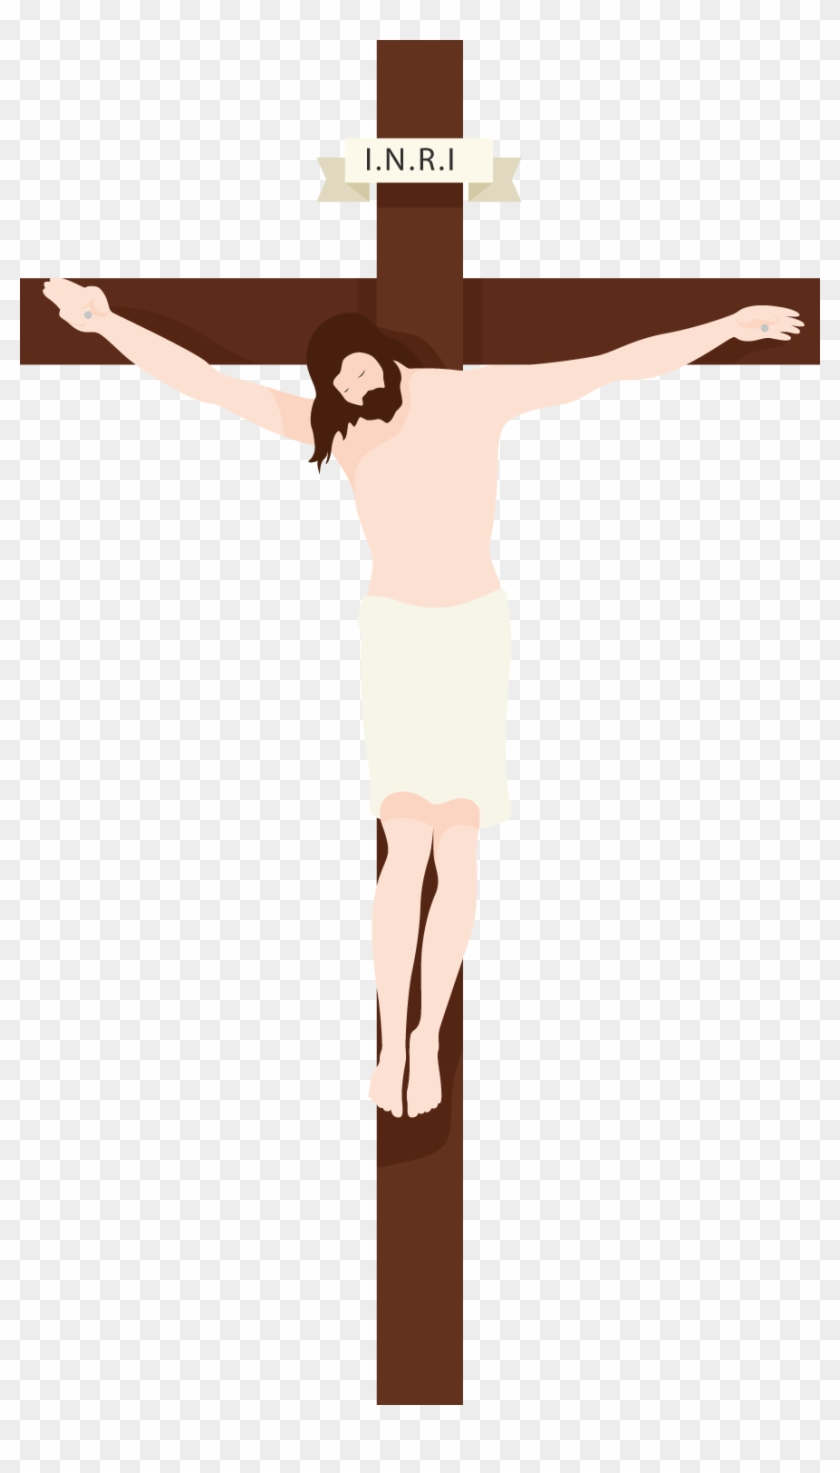 Jesus Chirist Clipart Png Image 01 1 - Jesus On Cross Png #110881